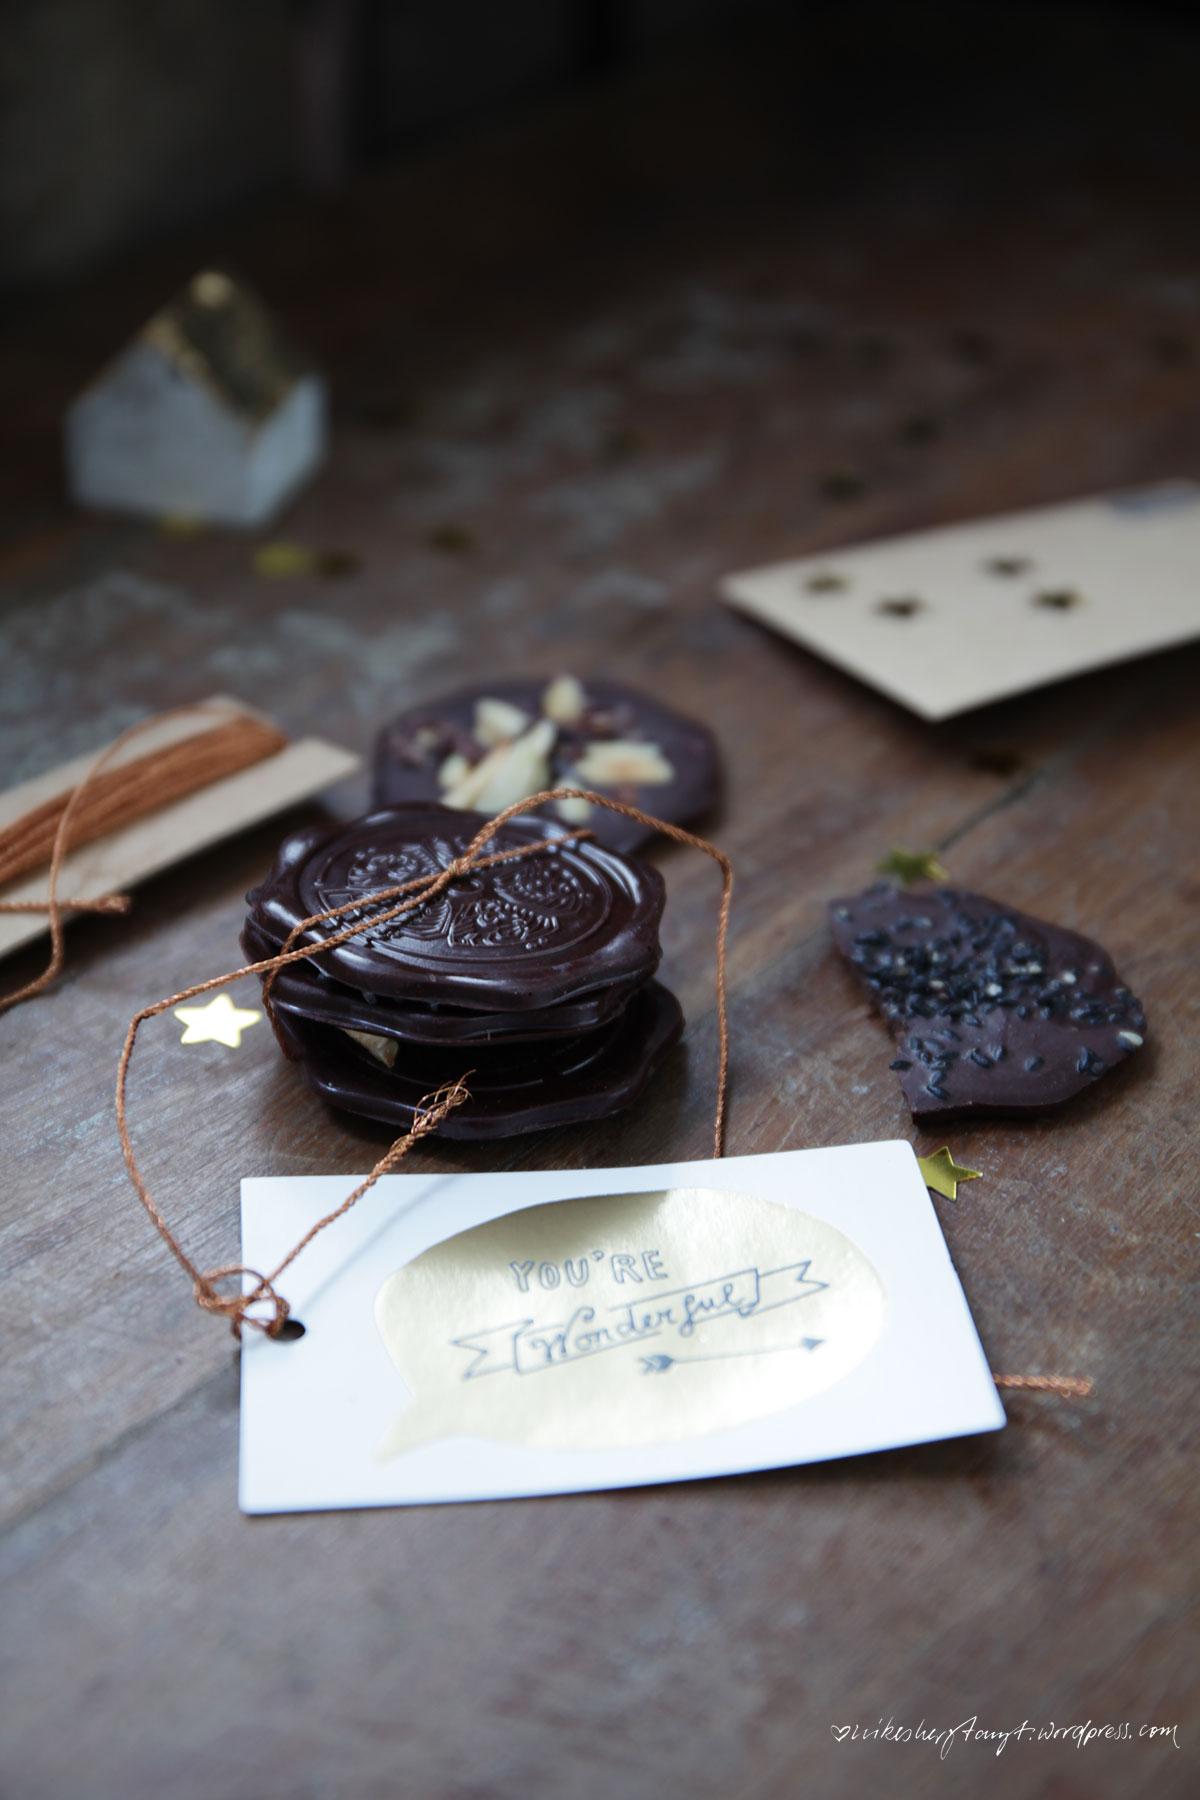 chocqlate vegane schokolade selber machen nikes herz tanzt. Black Bedroom Furniture Sets. Home Design Ideas